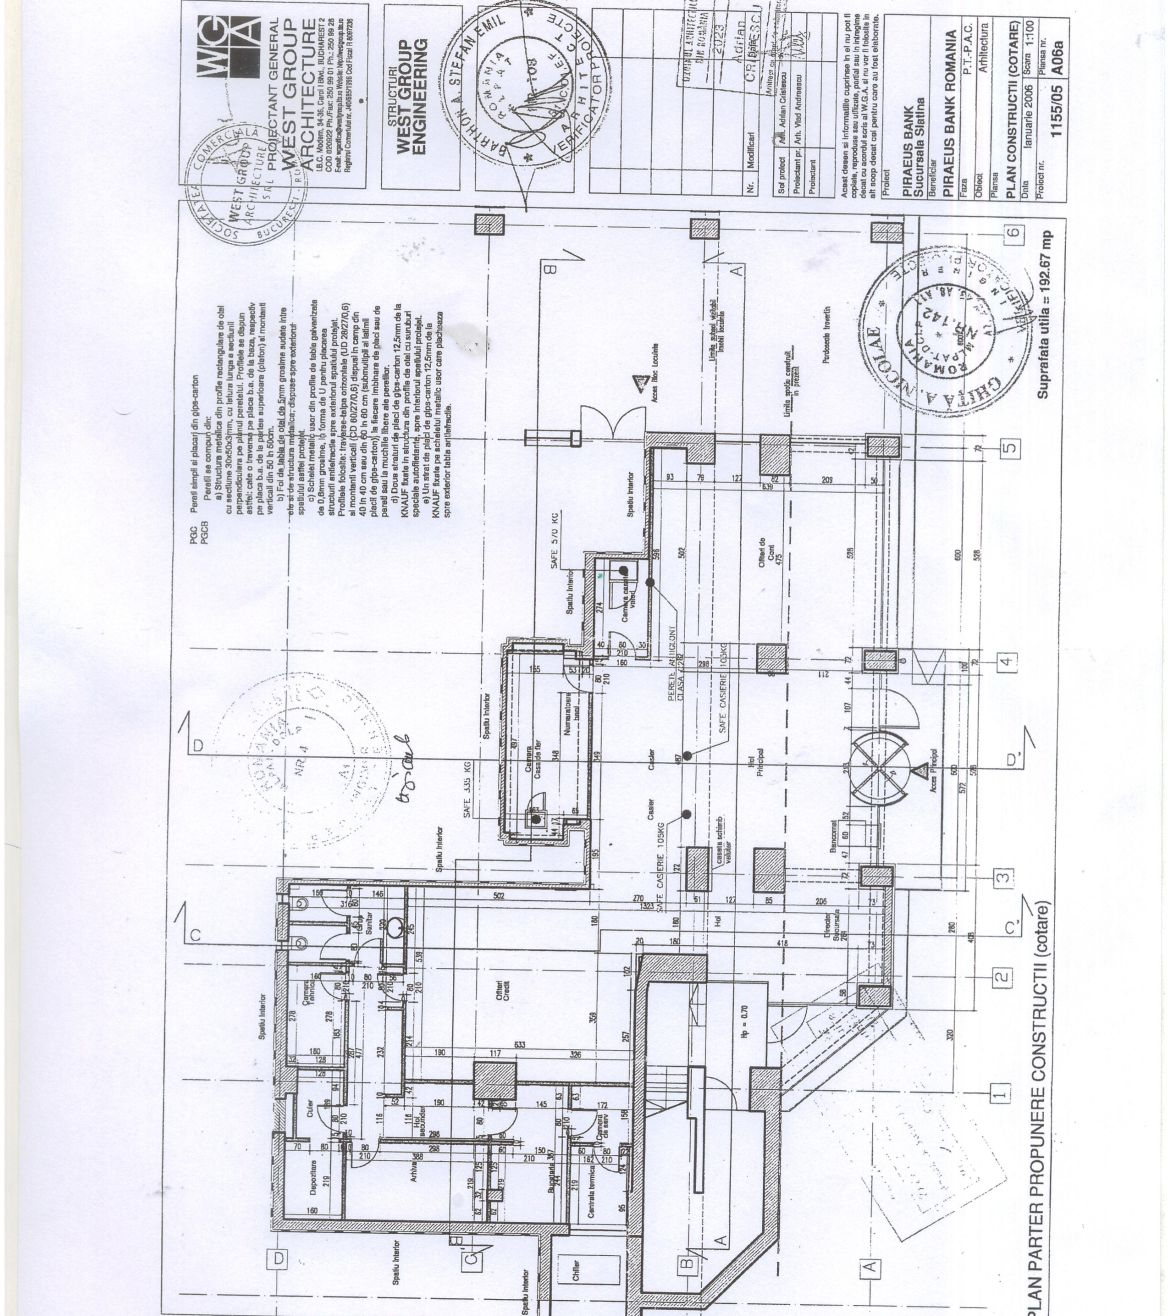 Slatina centru, inchiriere spatiu comercial Bulevardul Alexandru Ioan Cuza, poza plan